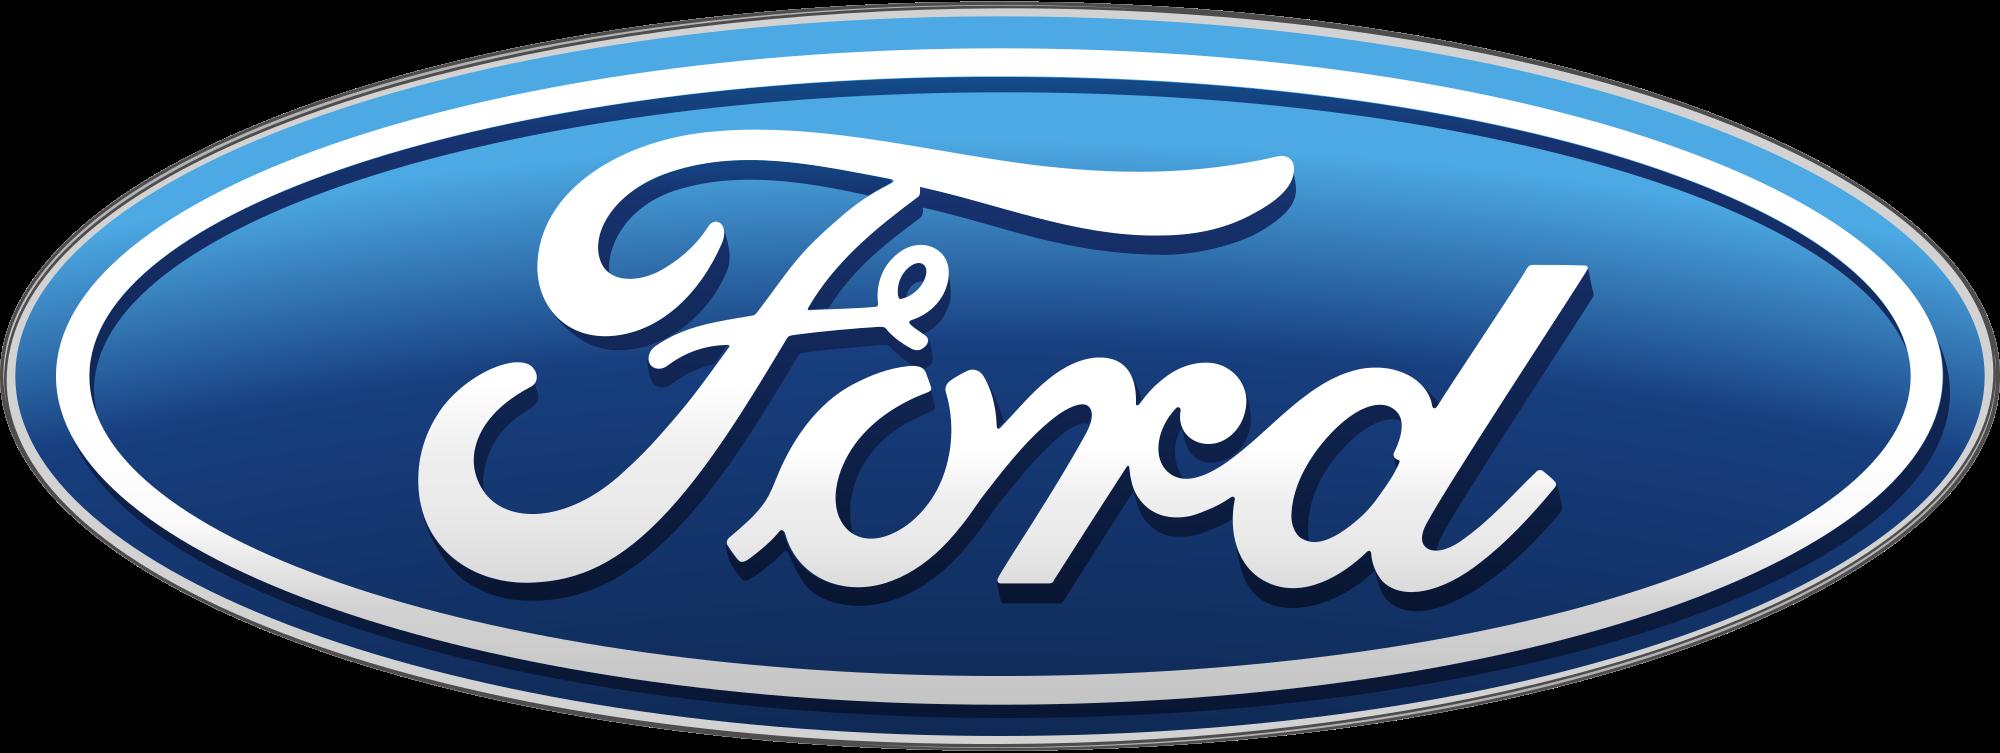 Jenkins Ford, LLC logo